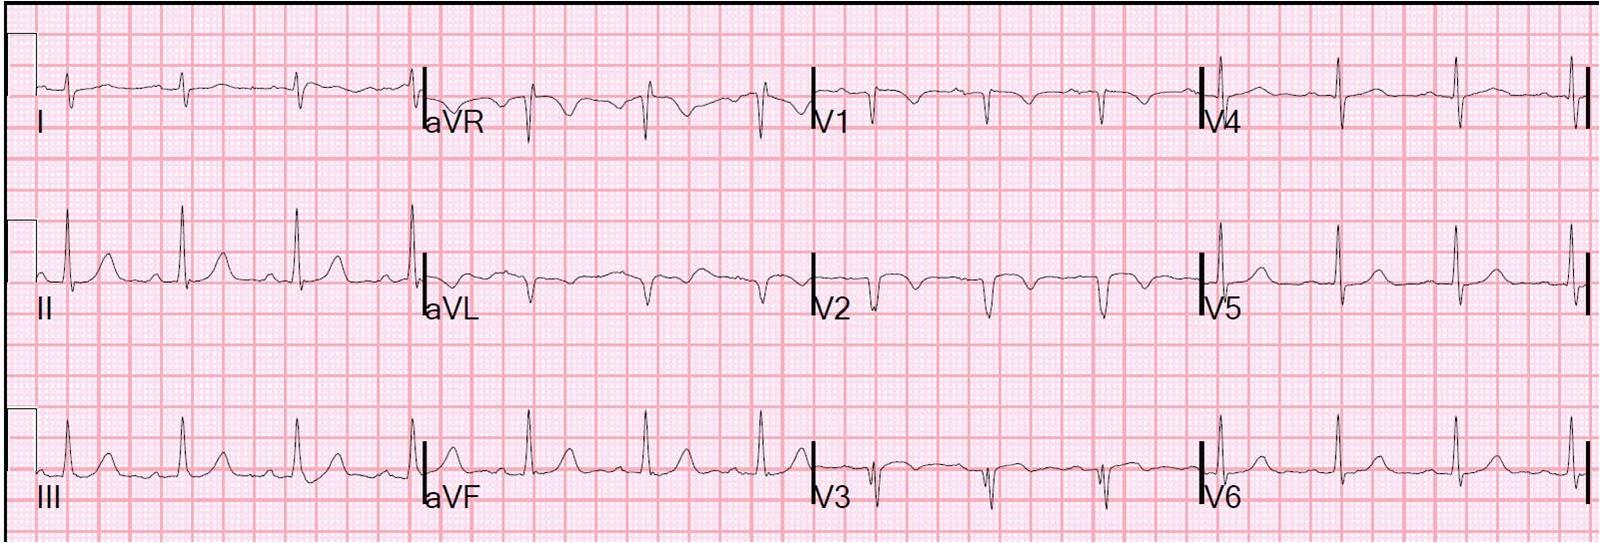 Dr. Smith's ECG Blog: ...Q Wave